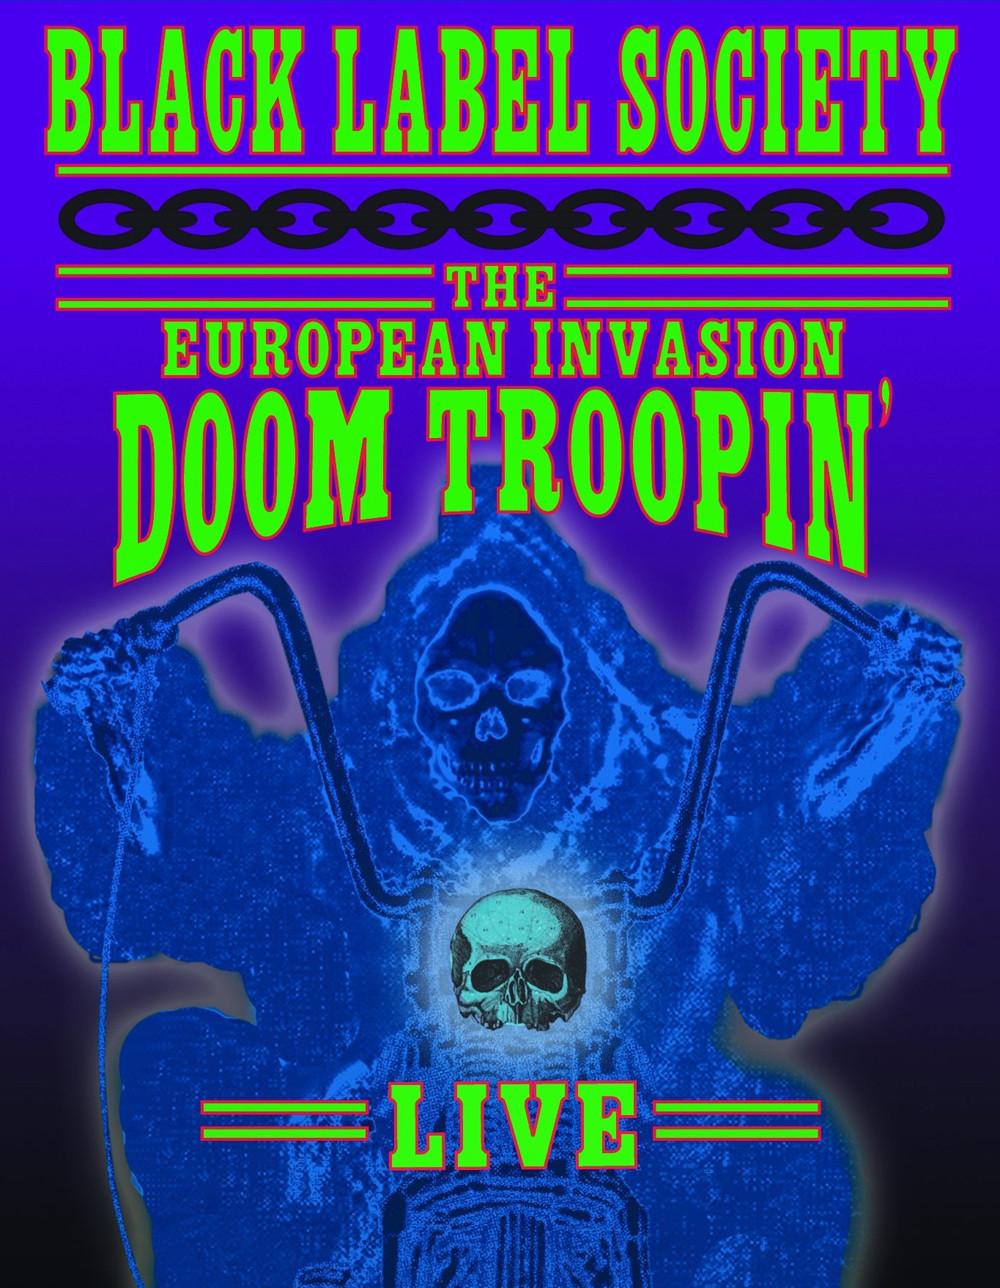 Black Label Society, The European Invasion, Doom Troopin', Cover